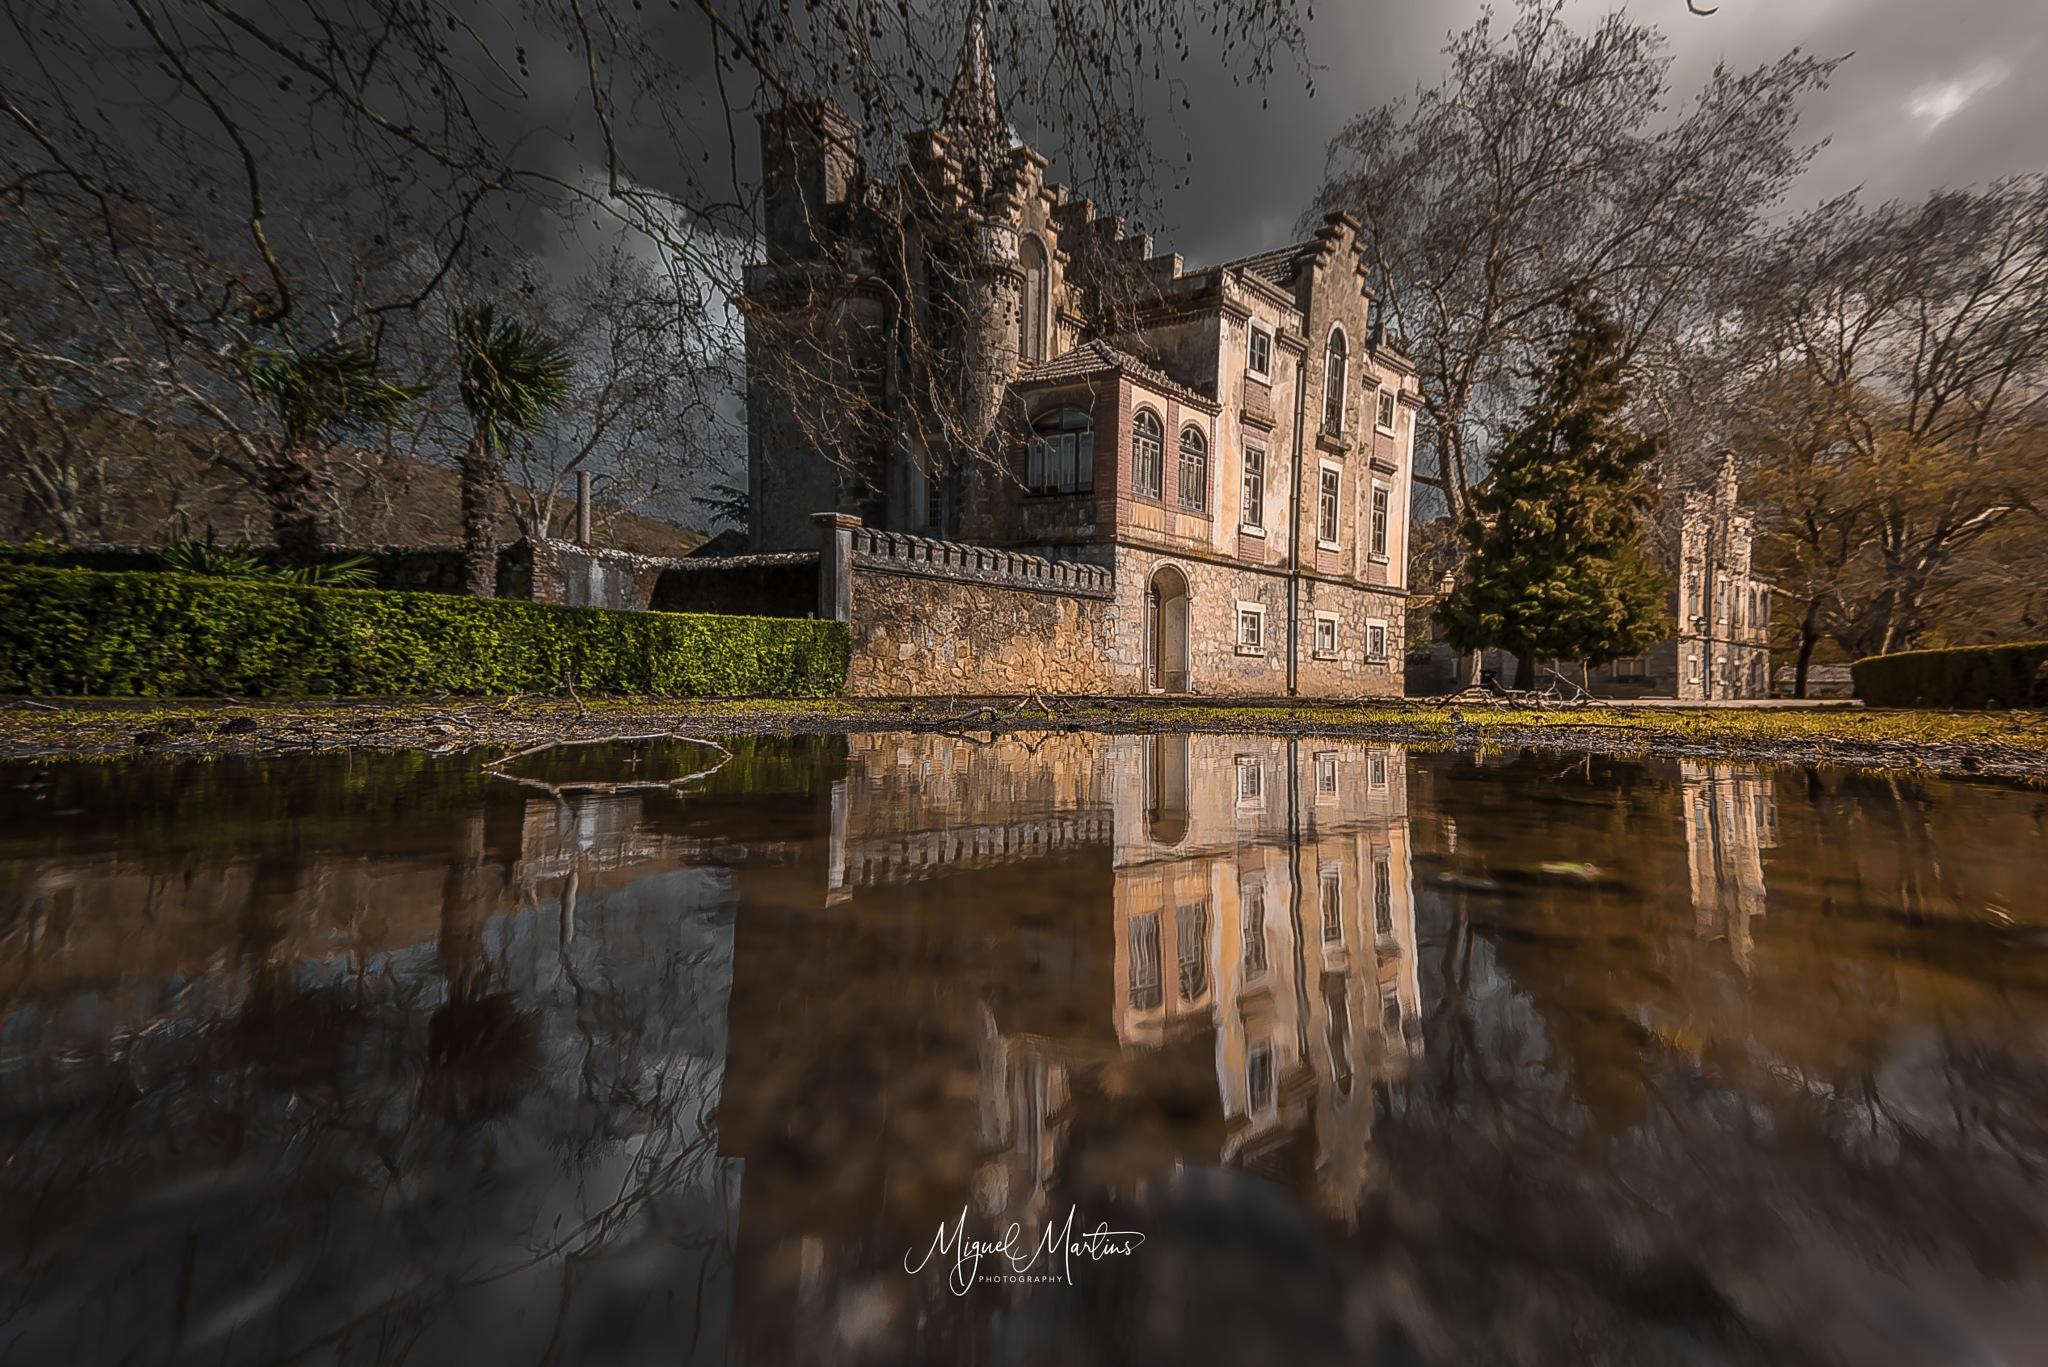 The Mansion by MiguelMartins